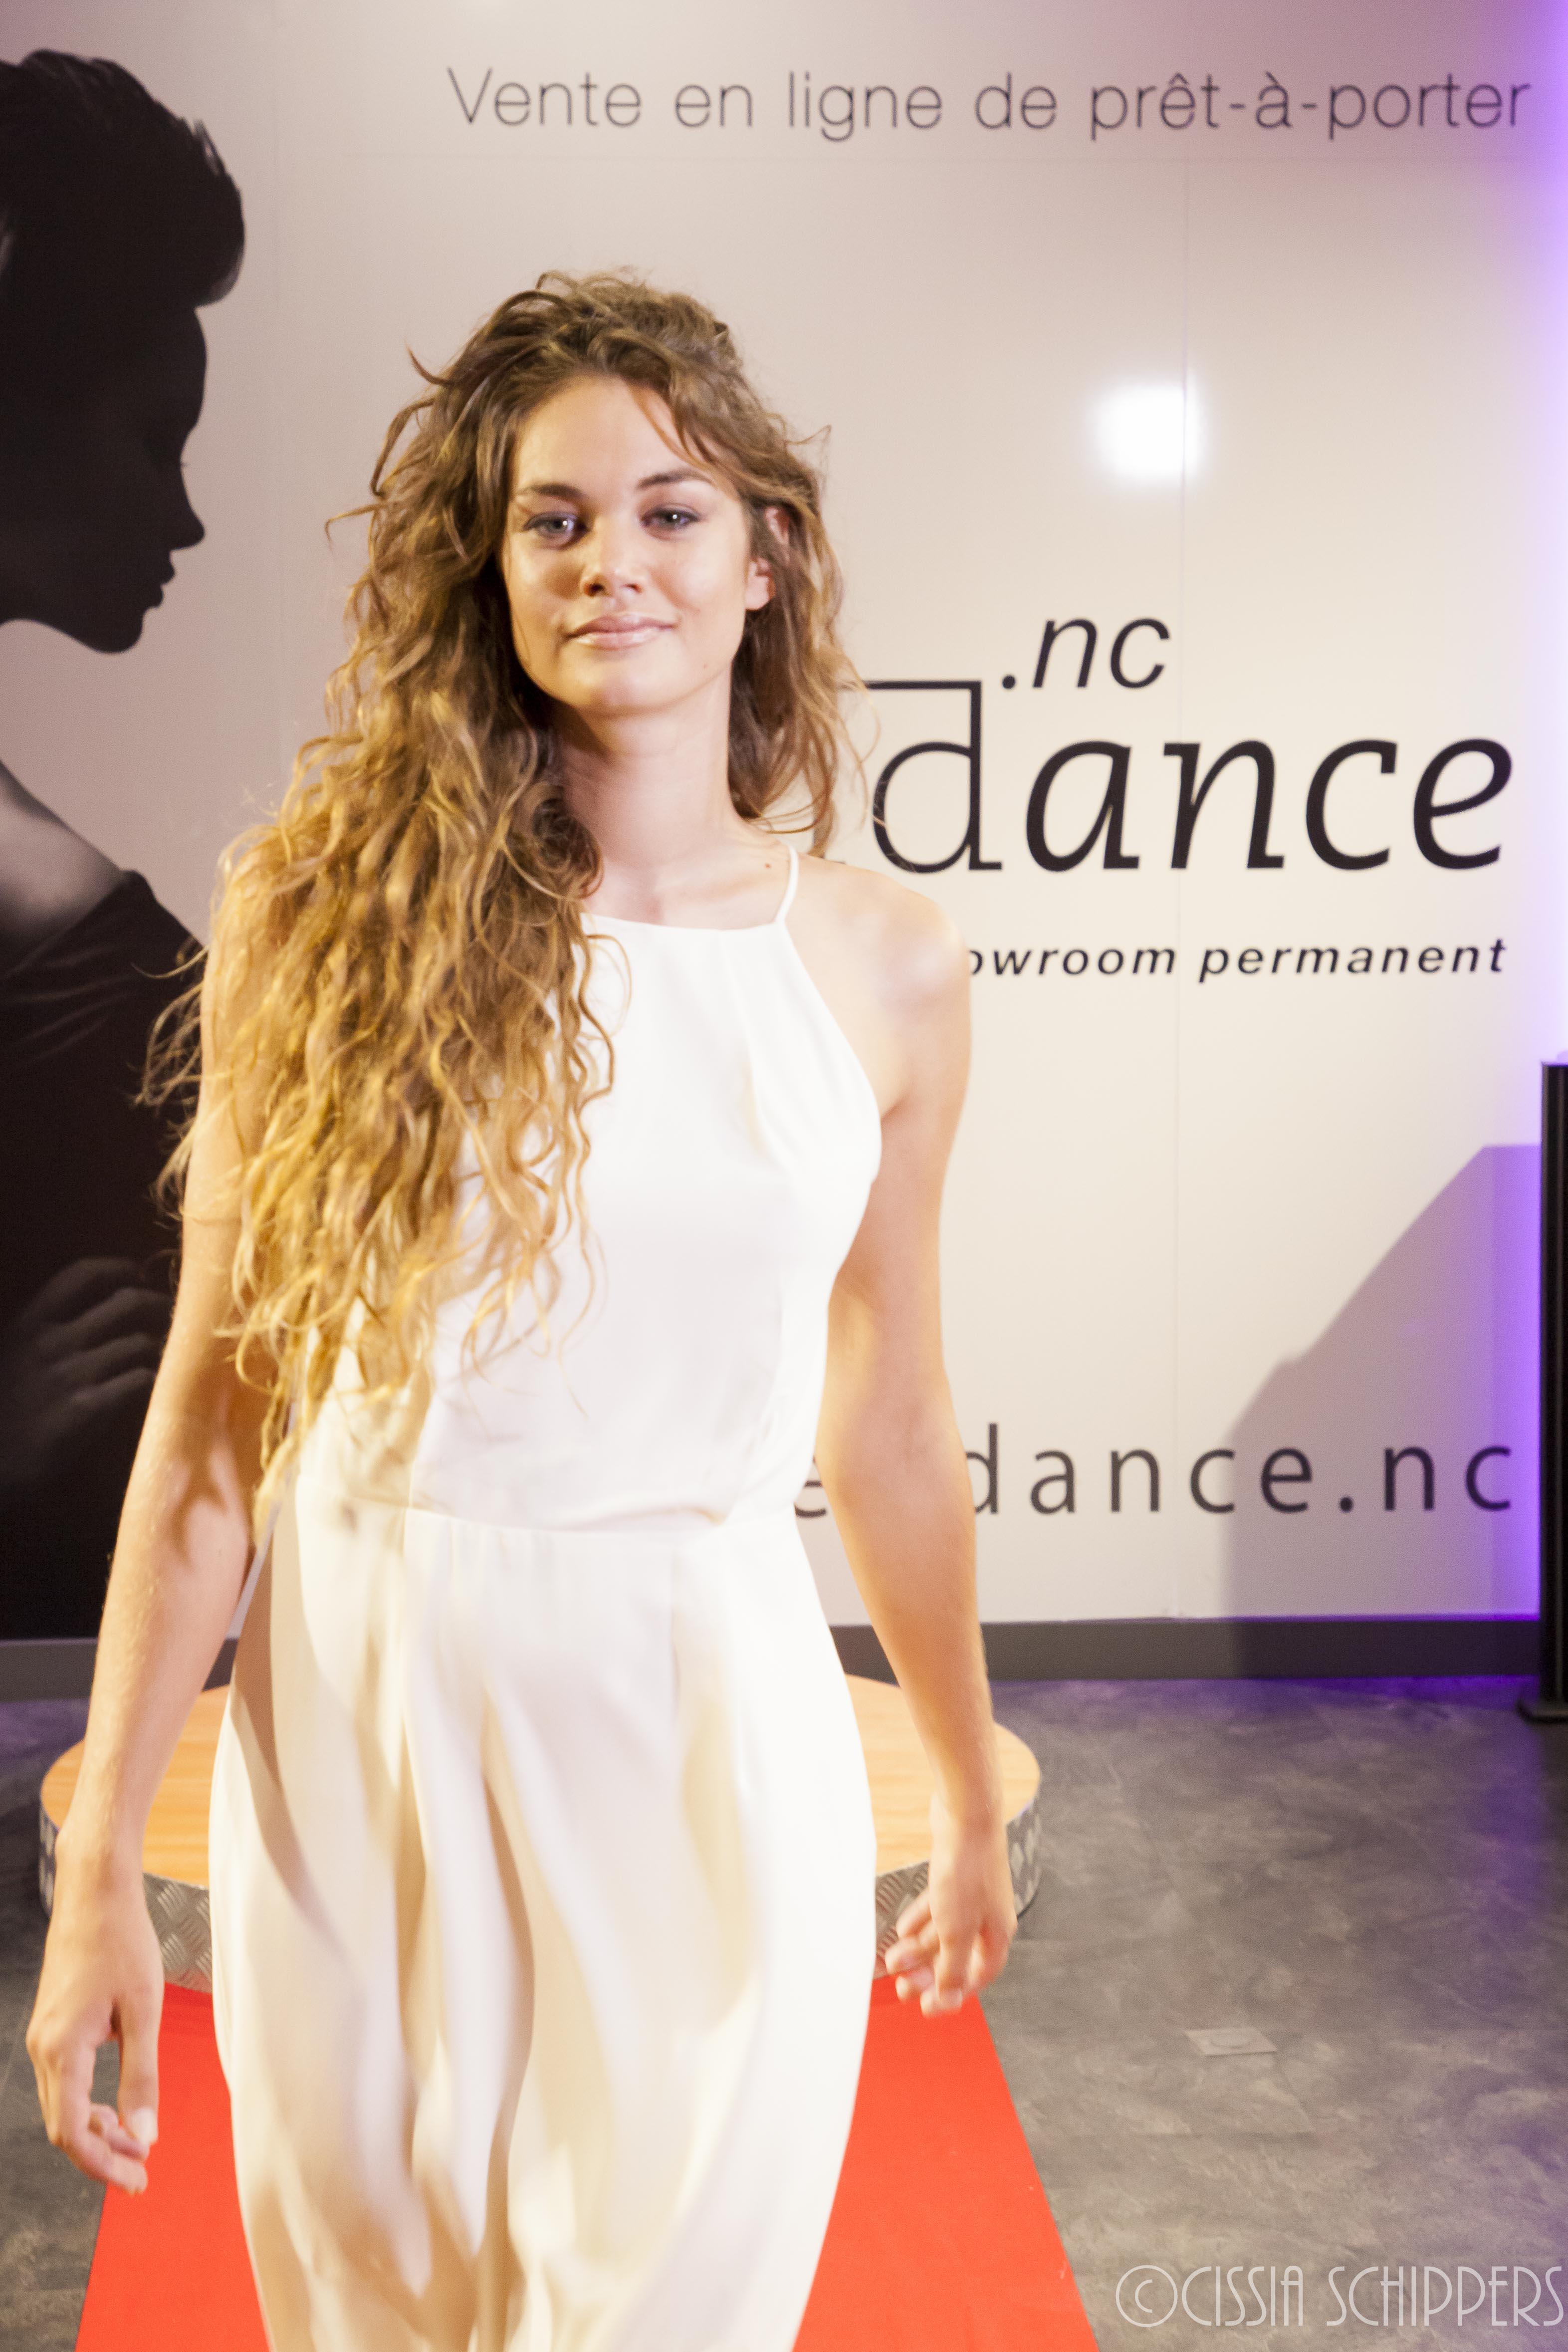 Tendance NC 2017 by Cissia Schippers photographe-8466